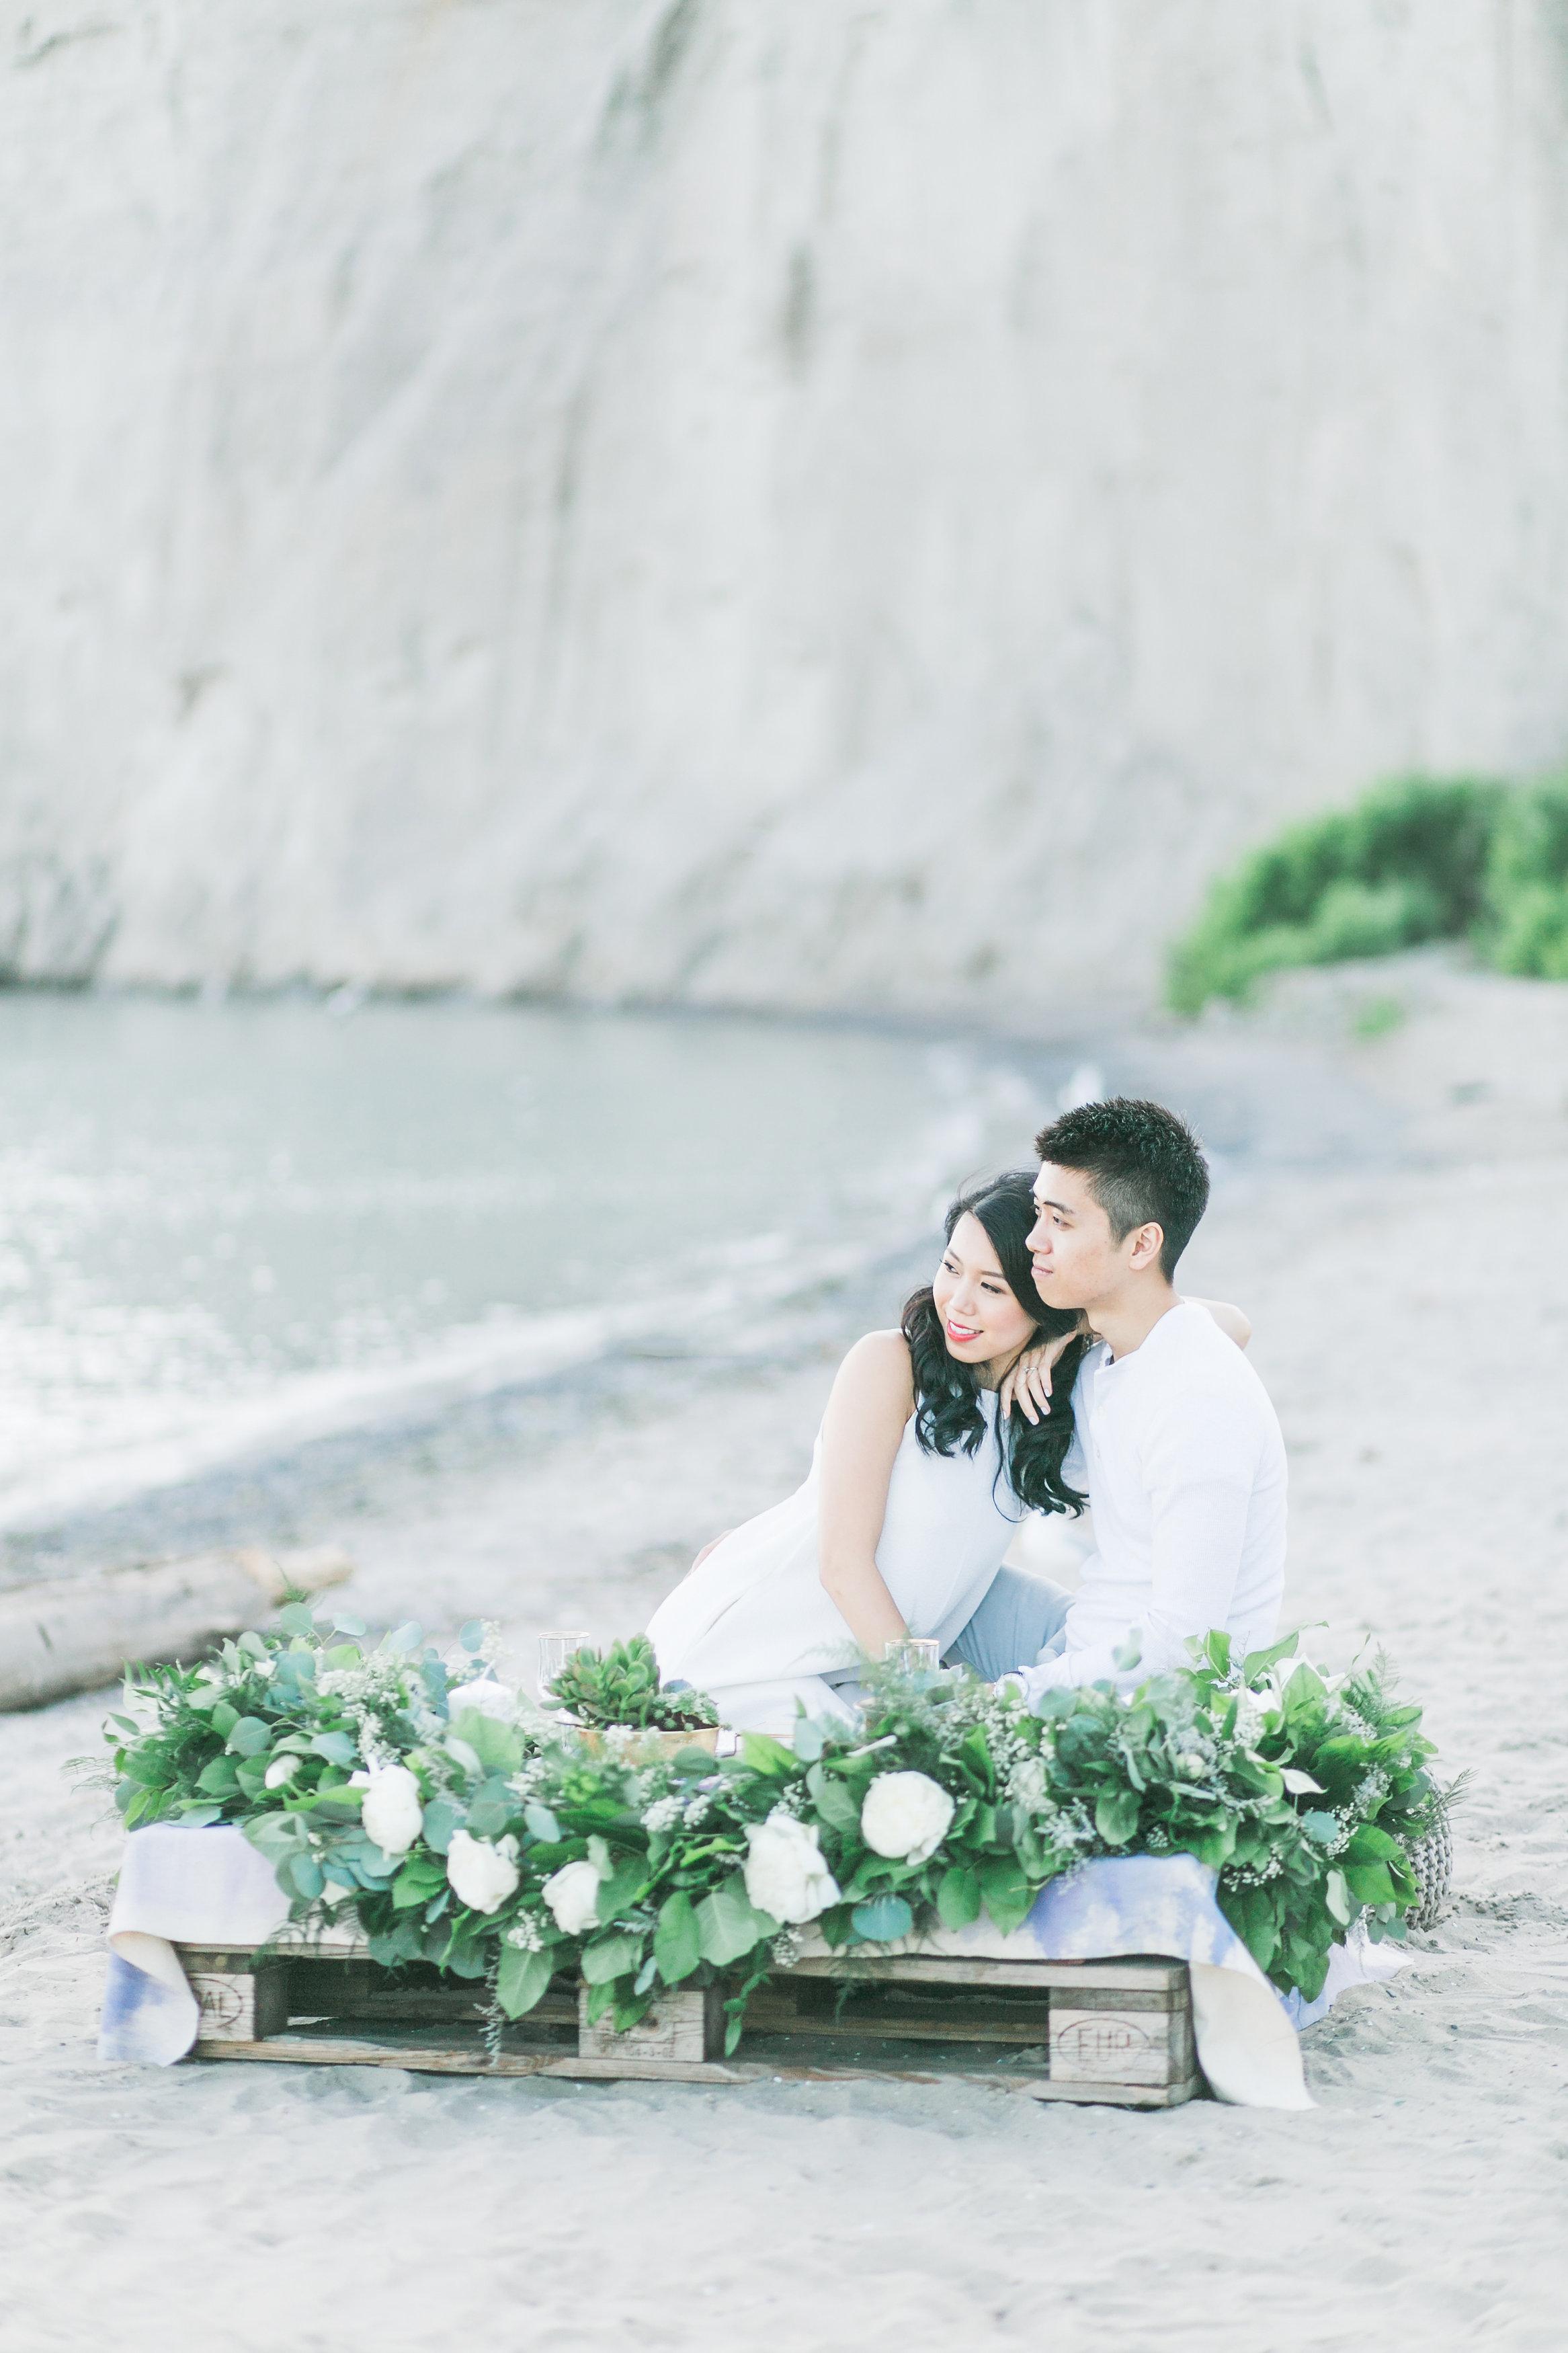 Phoebe Lo Events Toronto Wedding - Scarbourough Bluffs Bohemian Beach Engagement 015.jpg